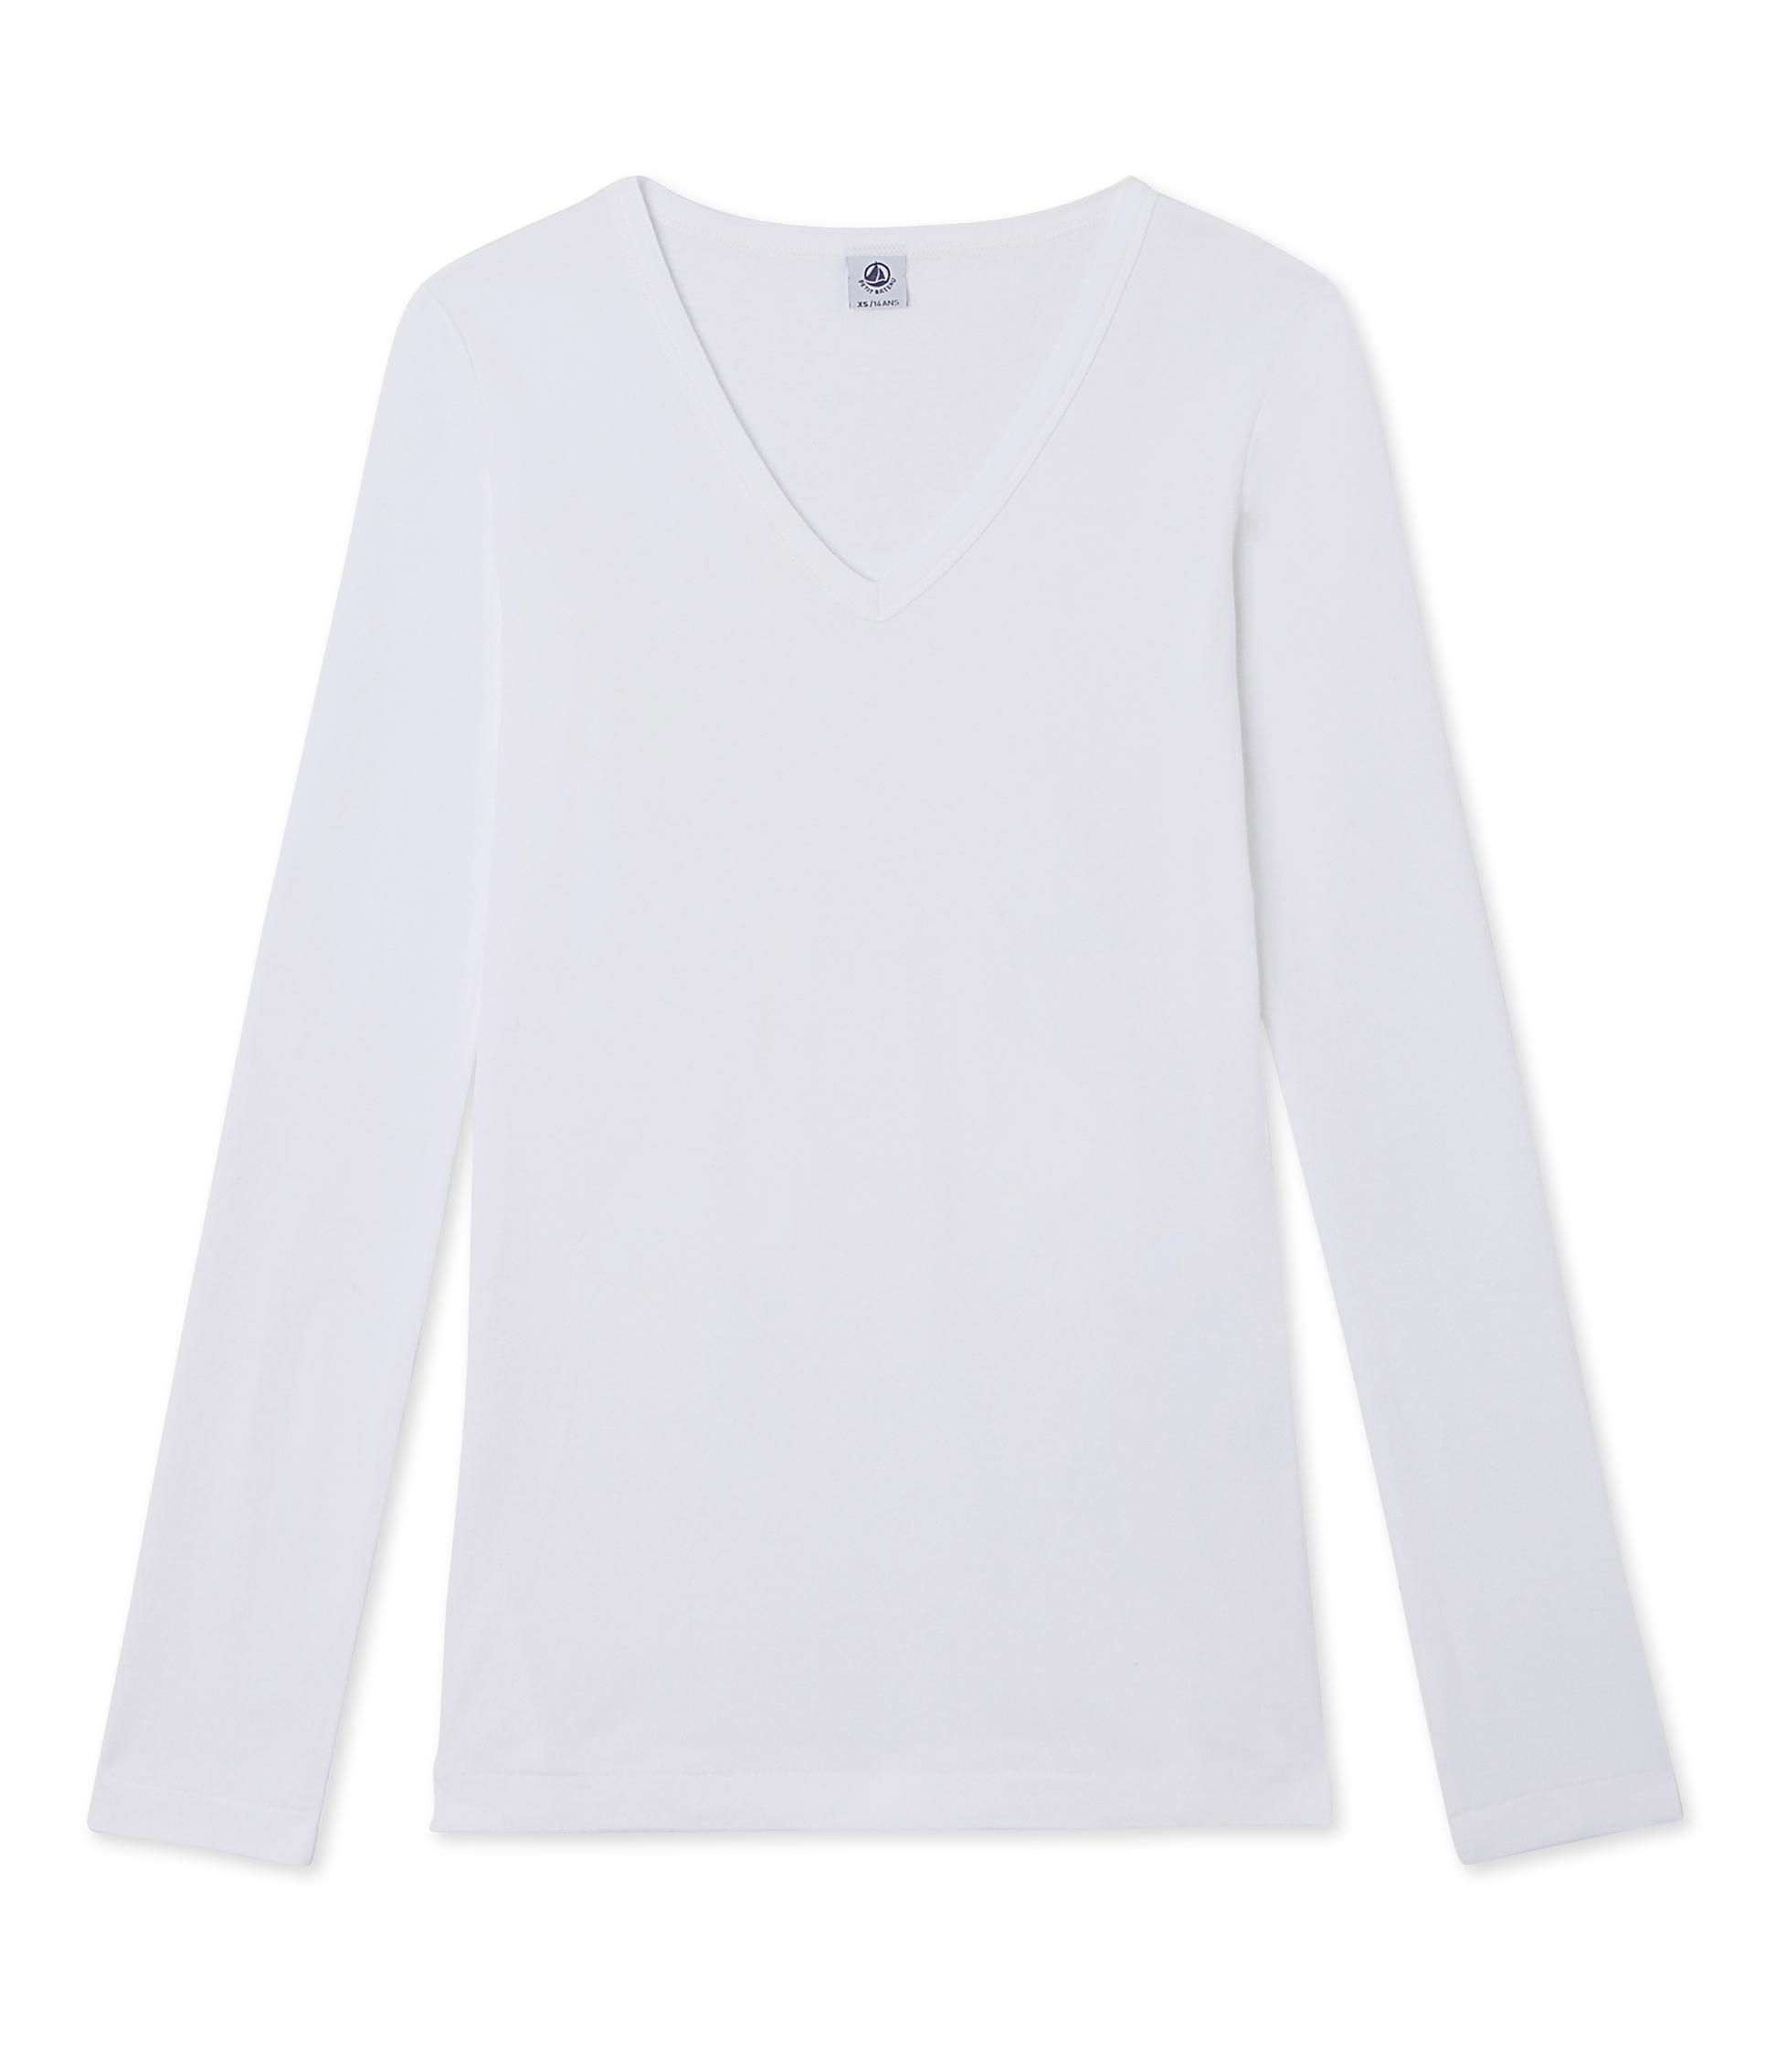 Women S Long Sleeved Iconic T Shirt